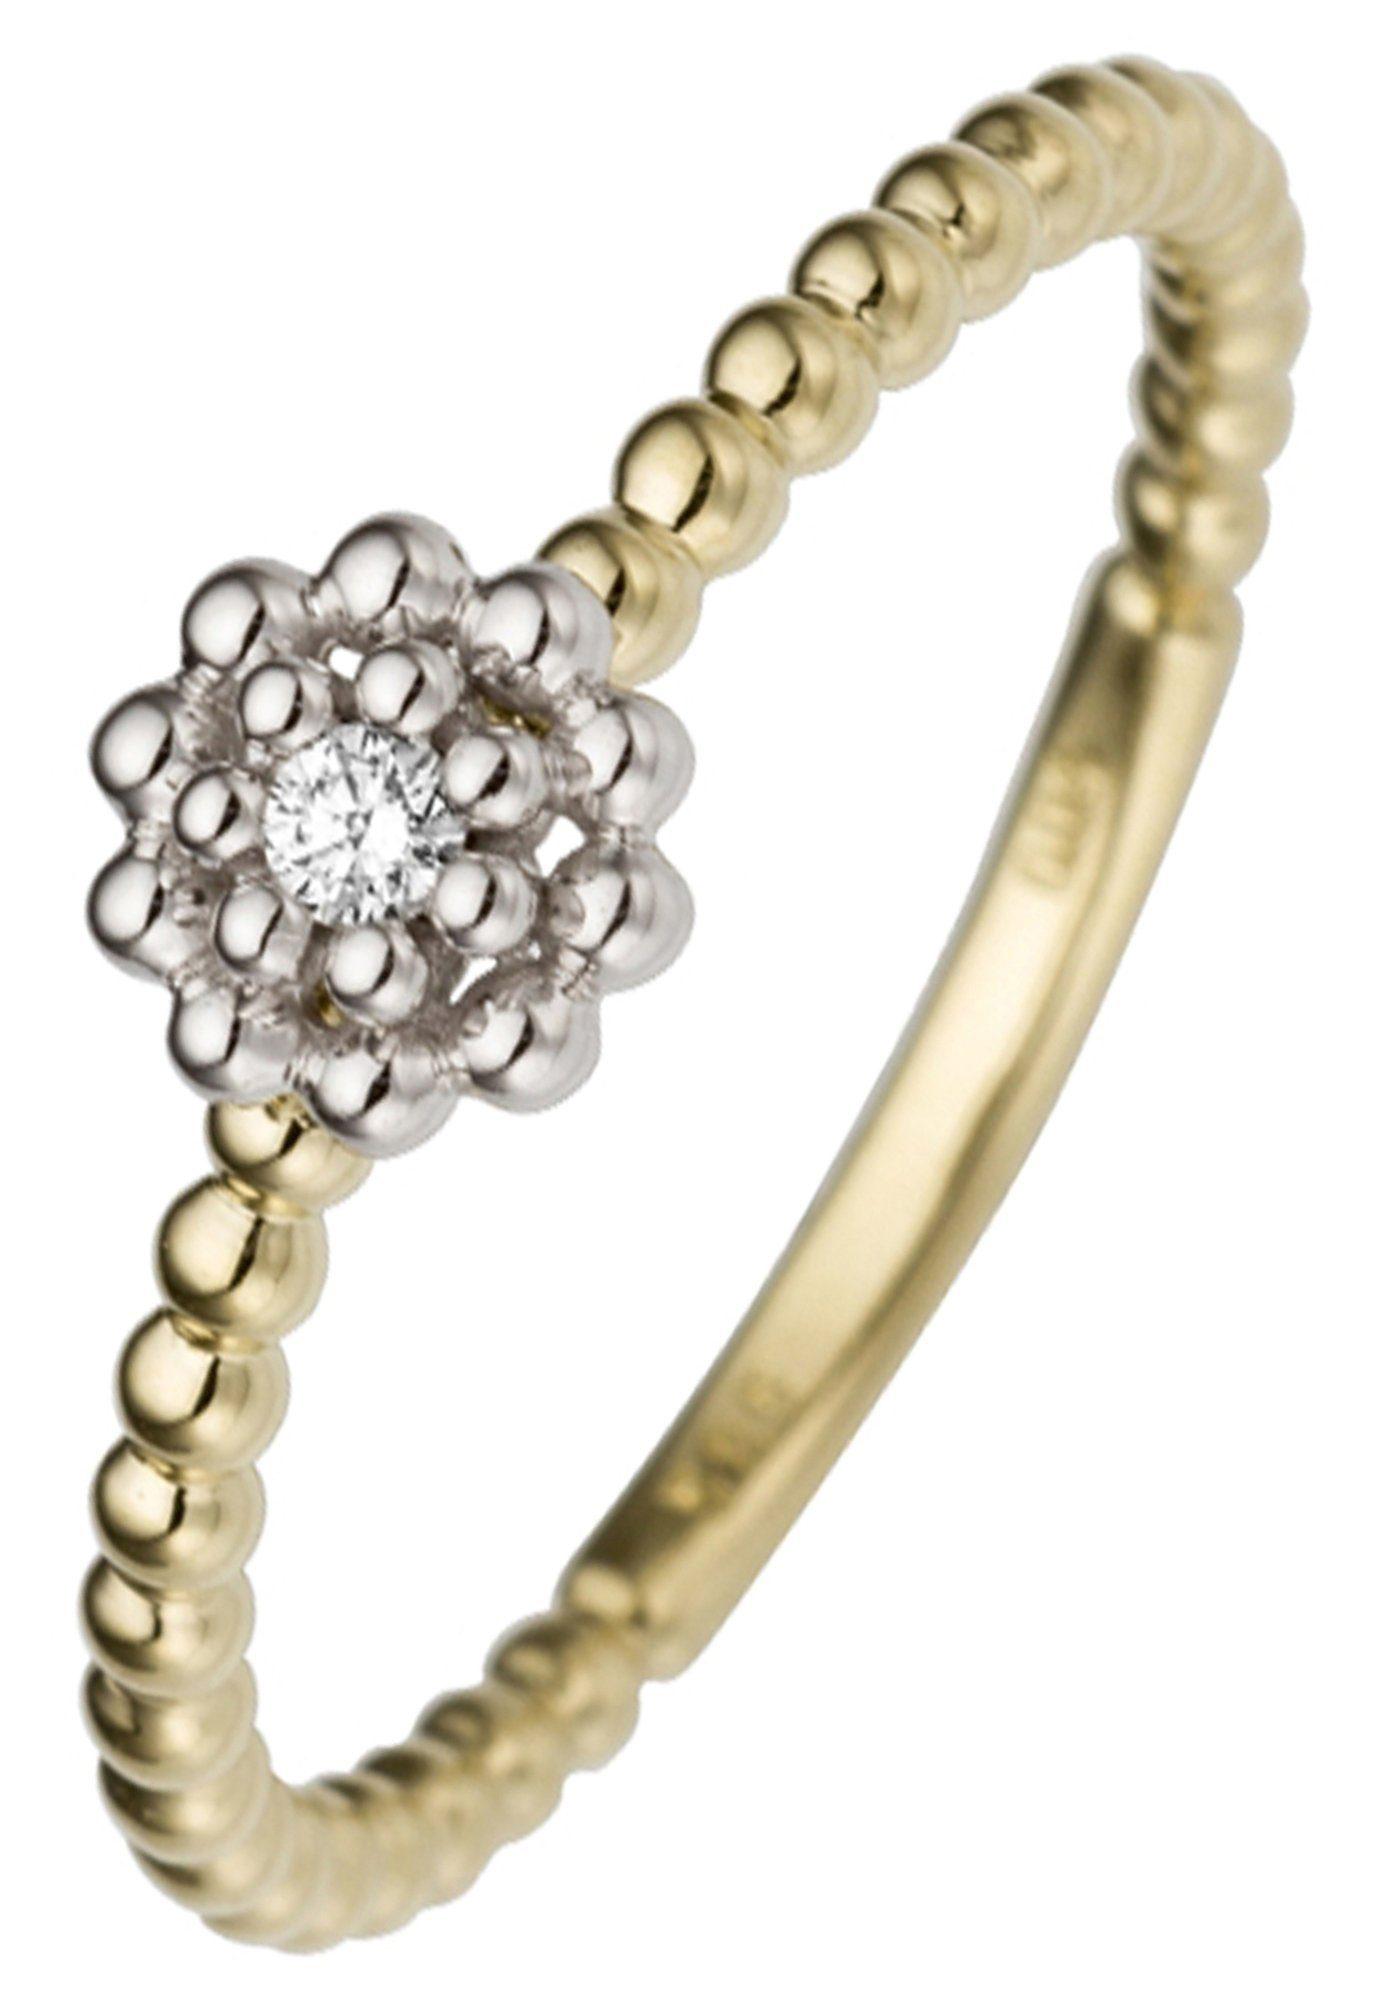 JOBO Diamantring »Blume« 585 Gold bicolor mit 1 Diamant